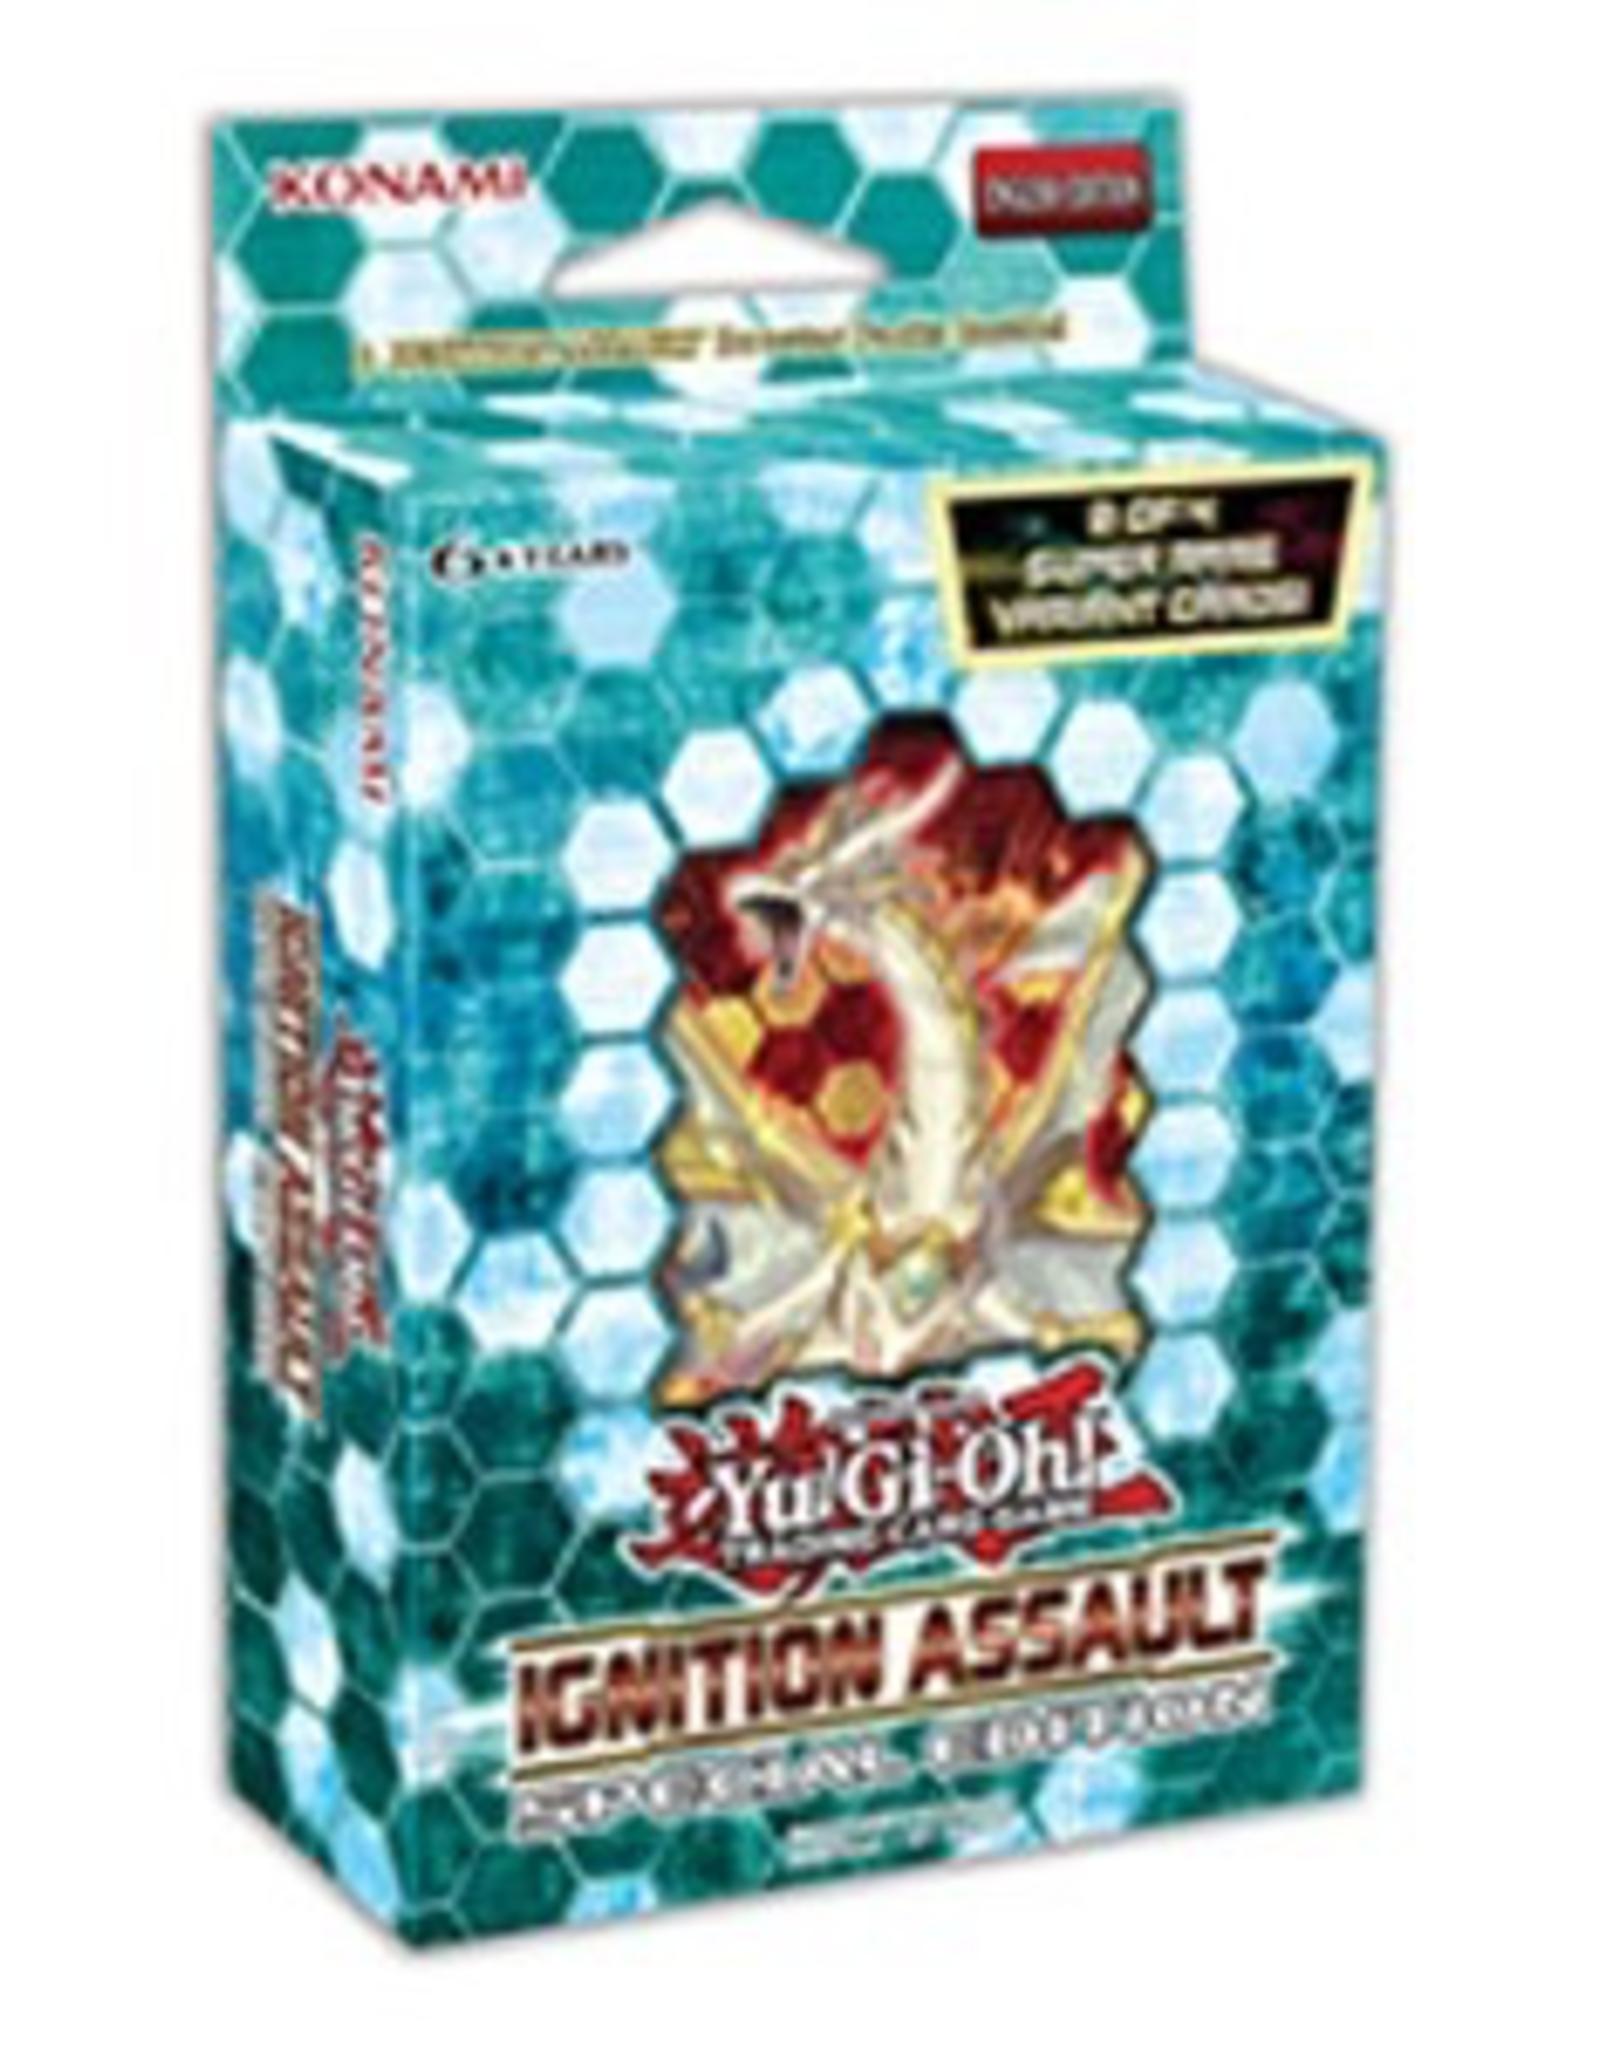 YGO - Hauptset YGO - Ignition Assault - Special Edition - DE